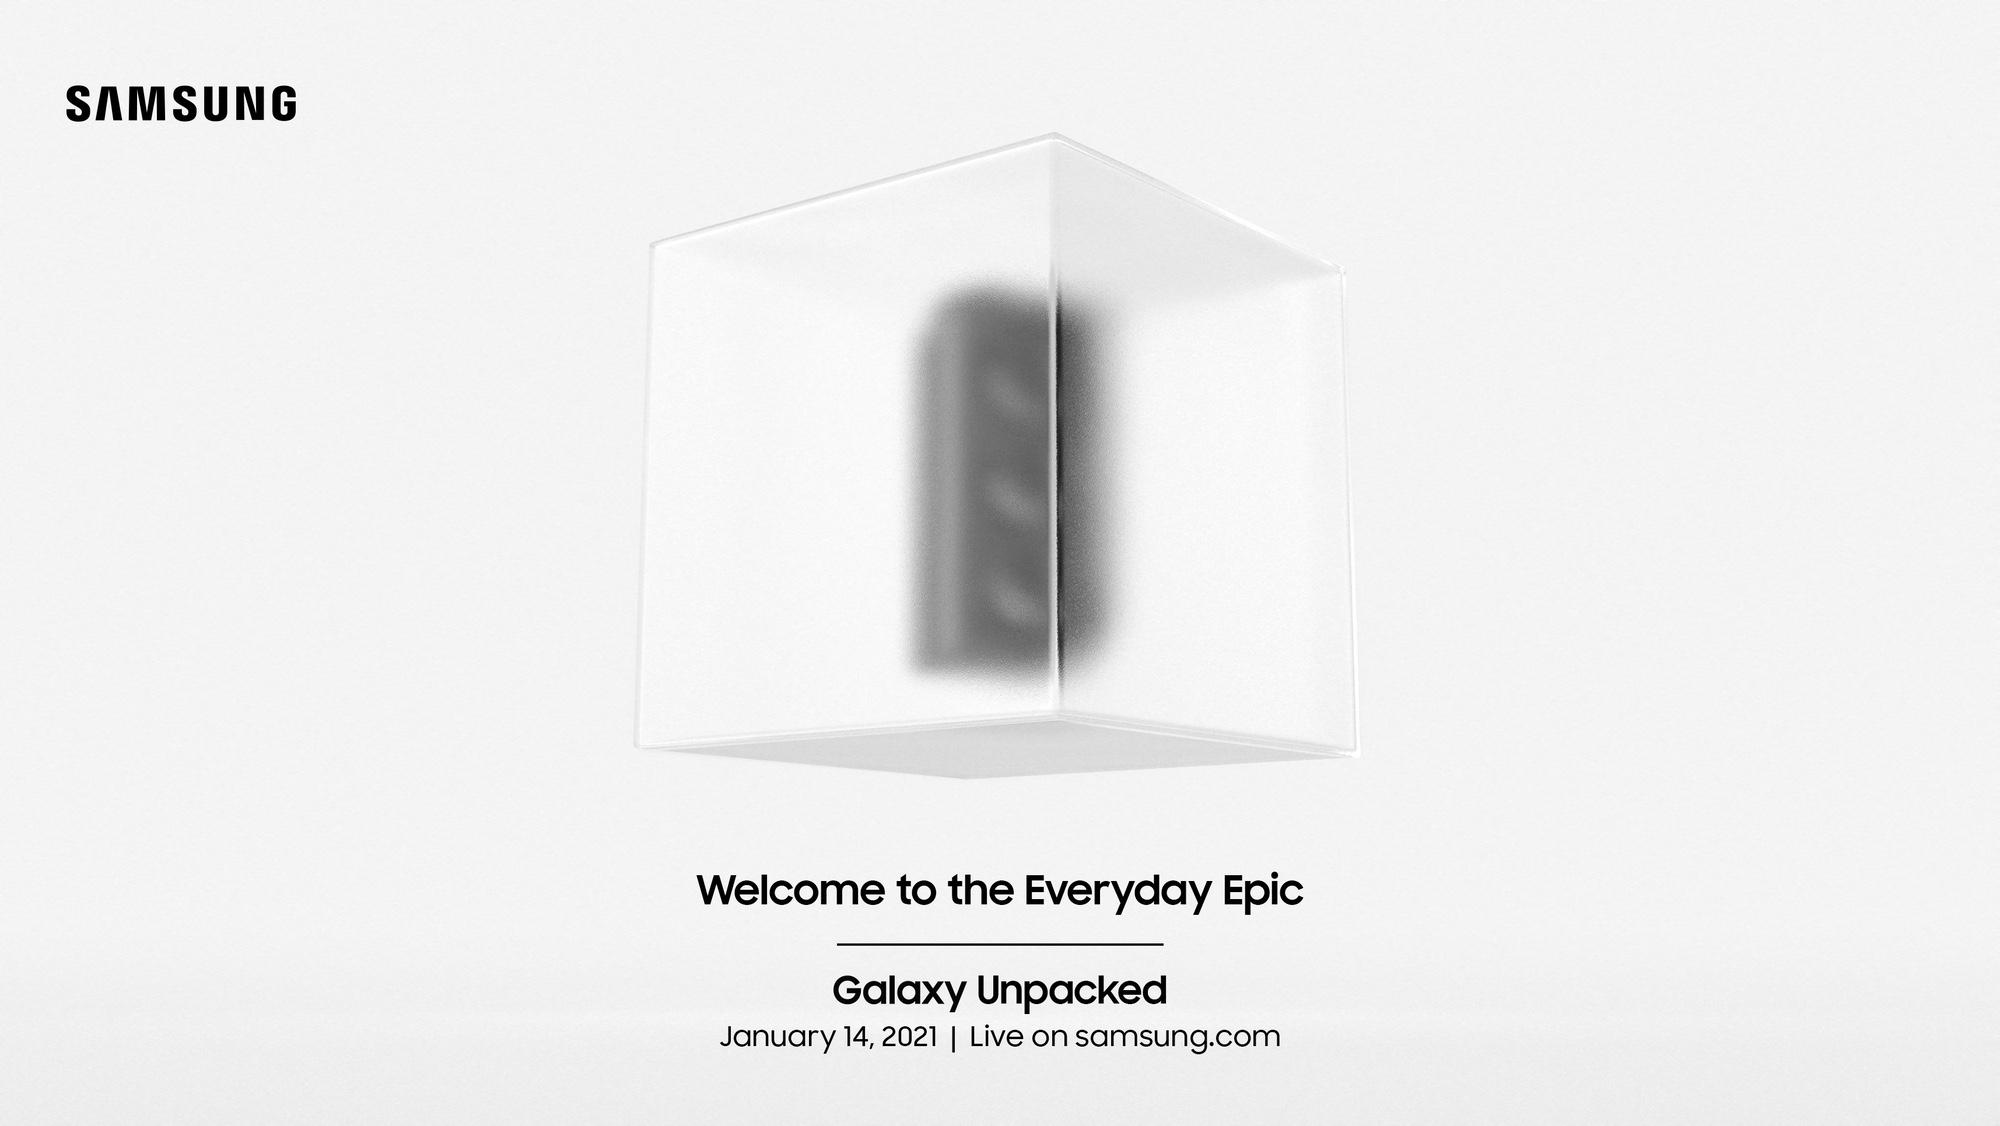 Samsung Unpacked 14 января 2021 г.